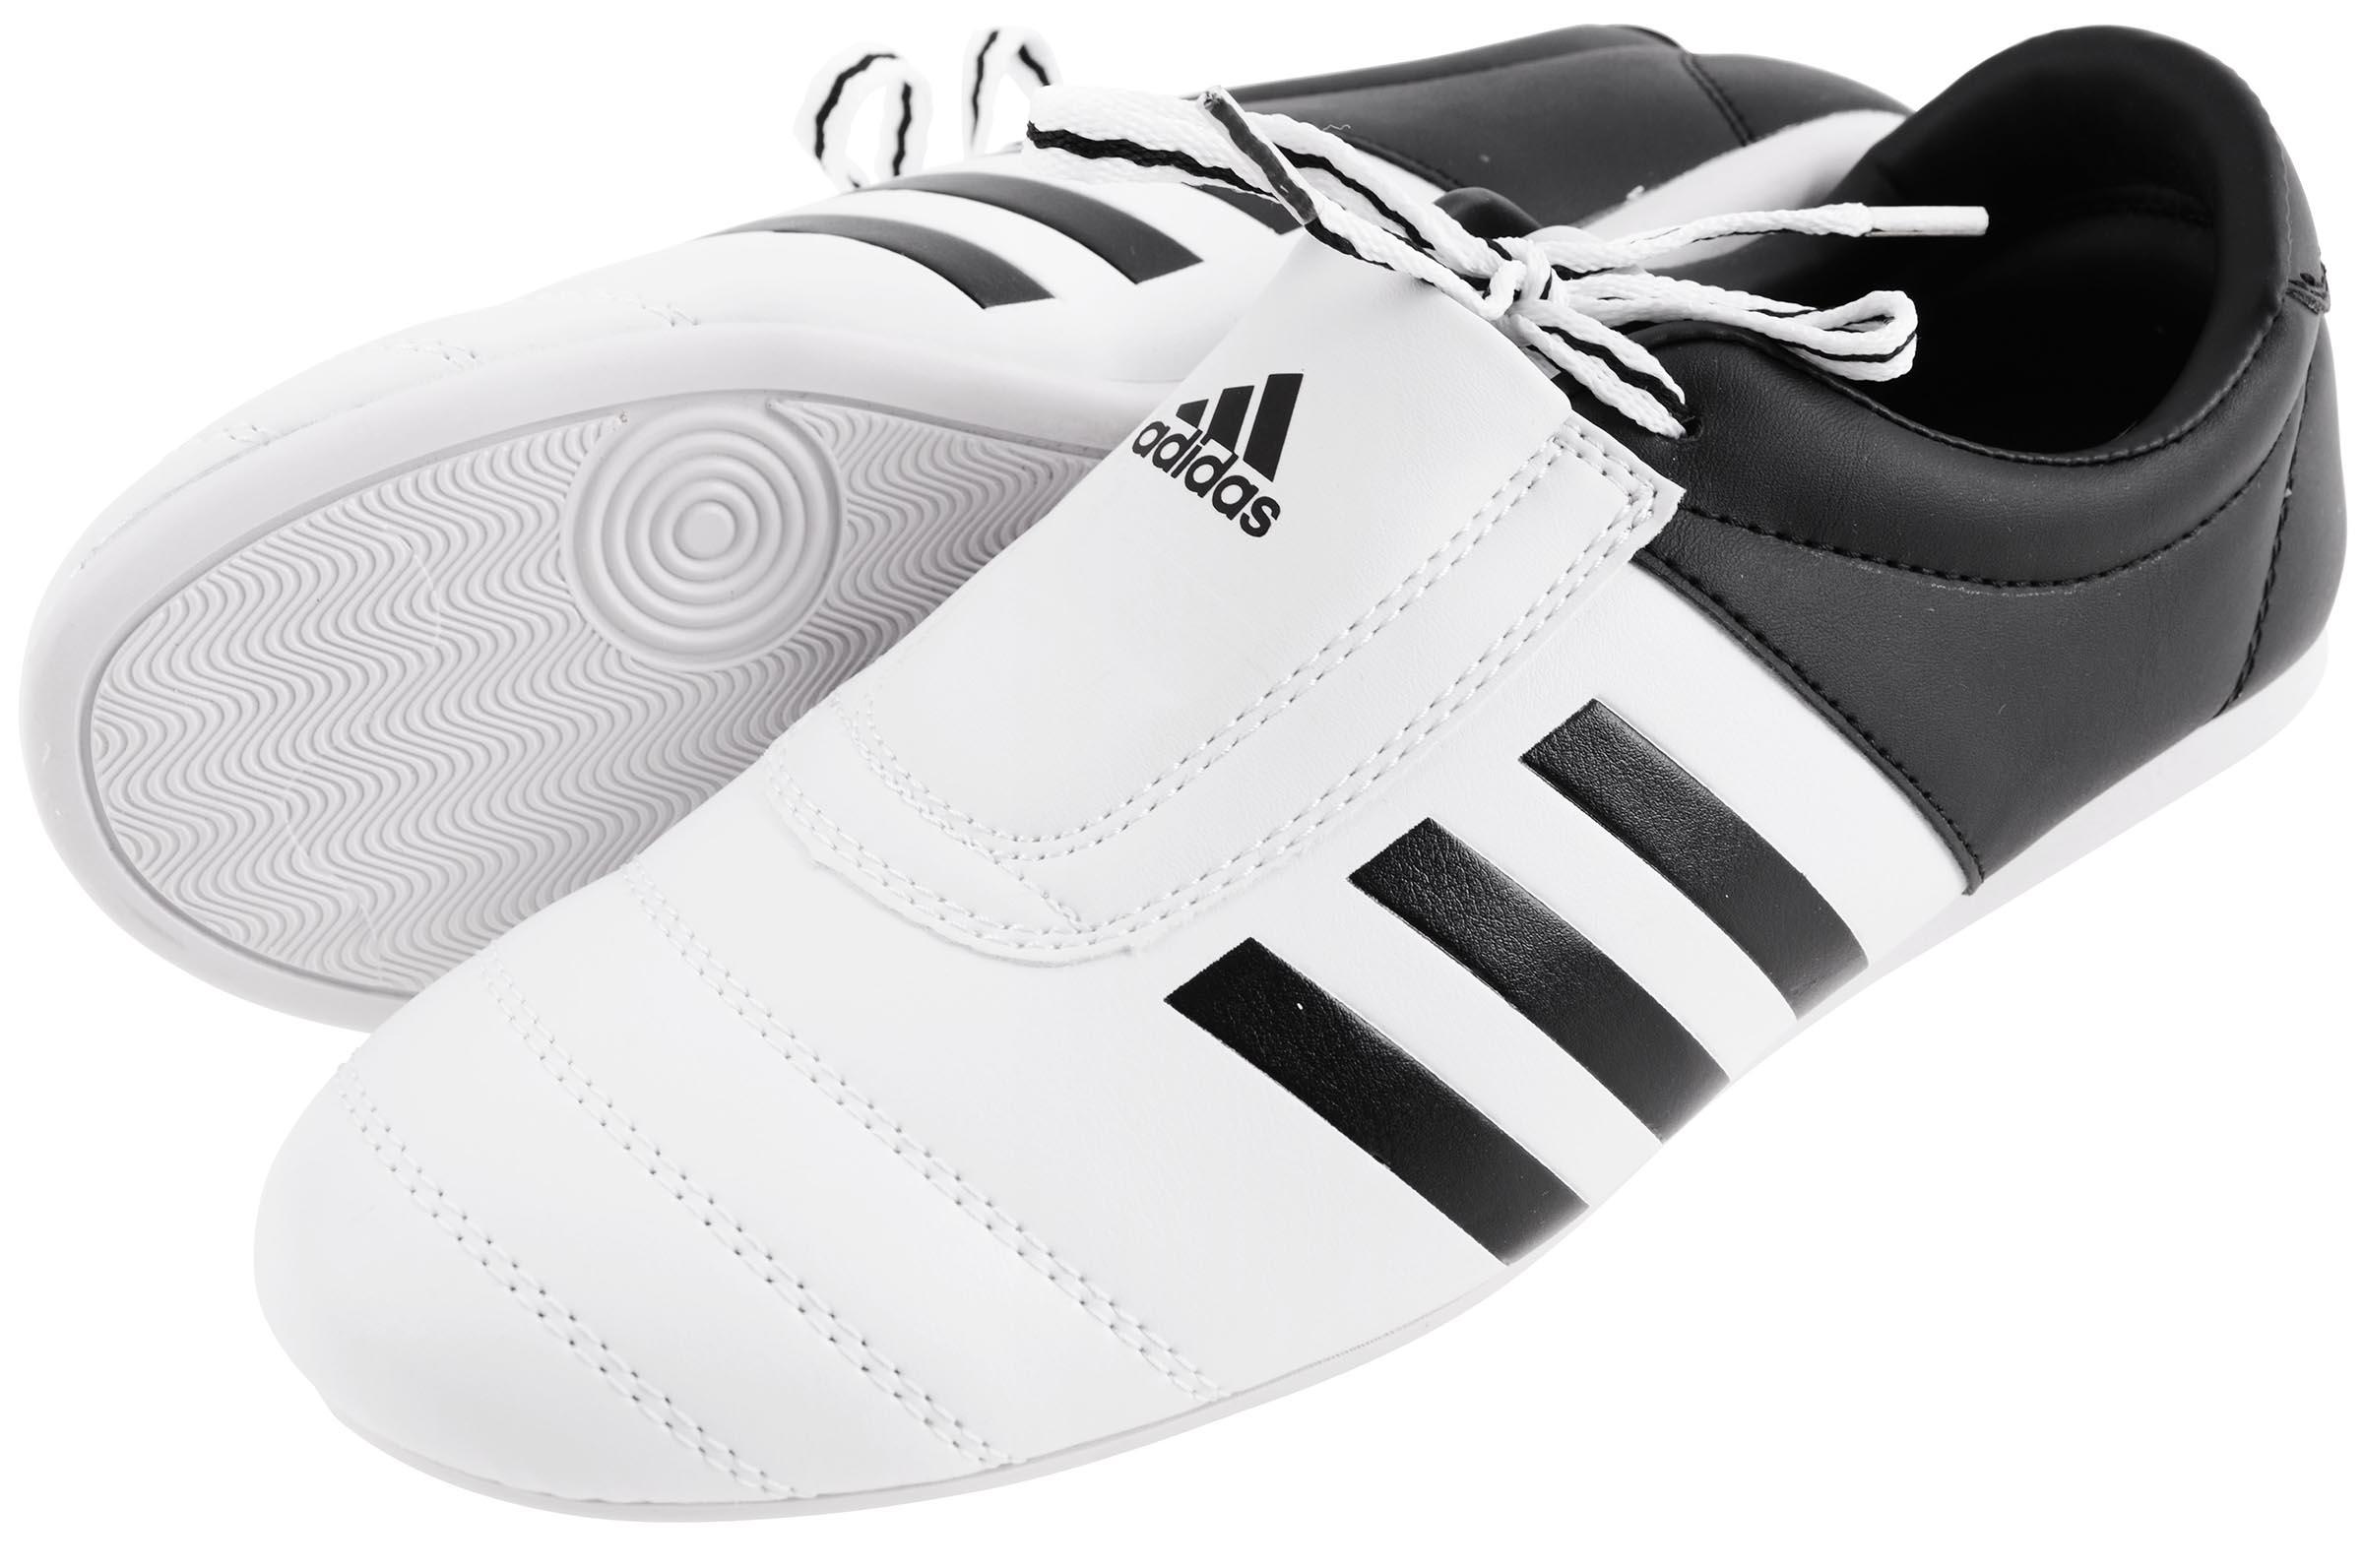 chaussures taekwondo adidas